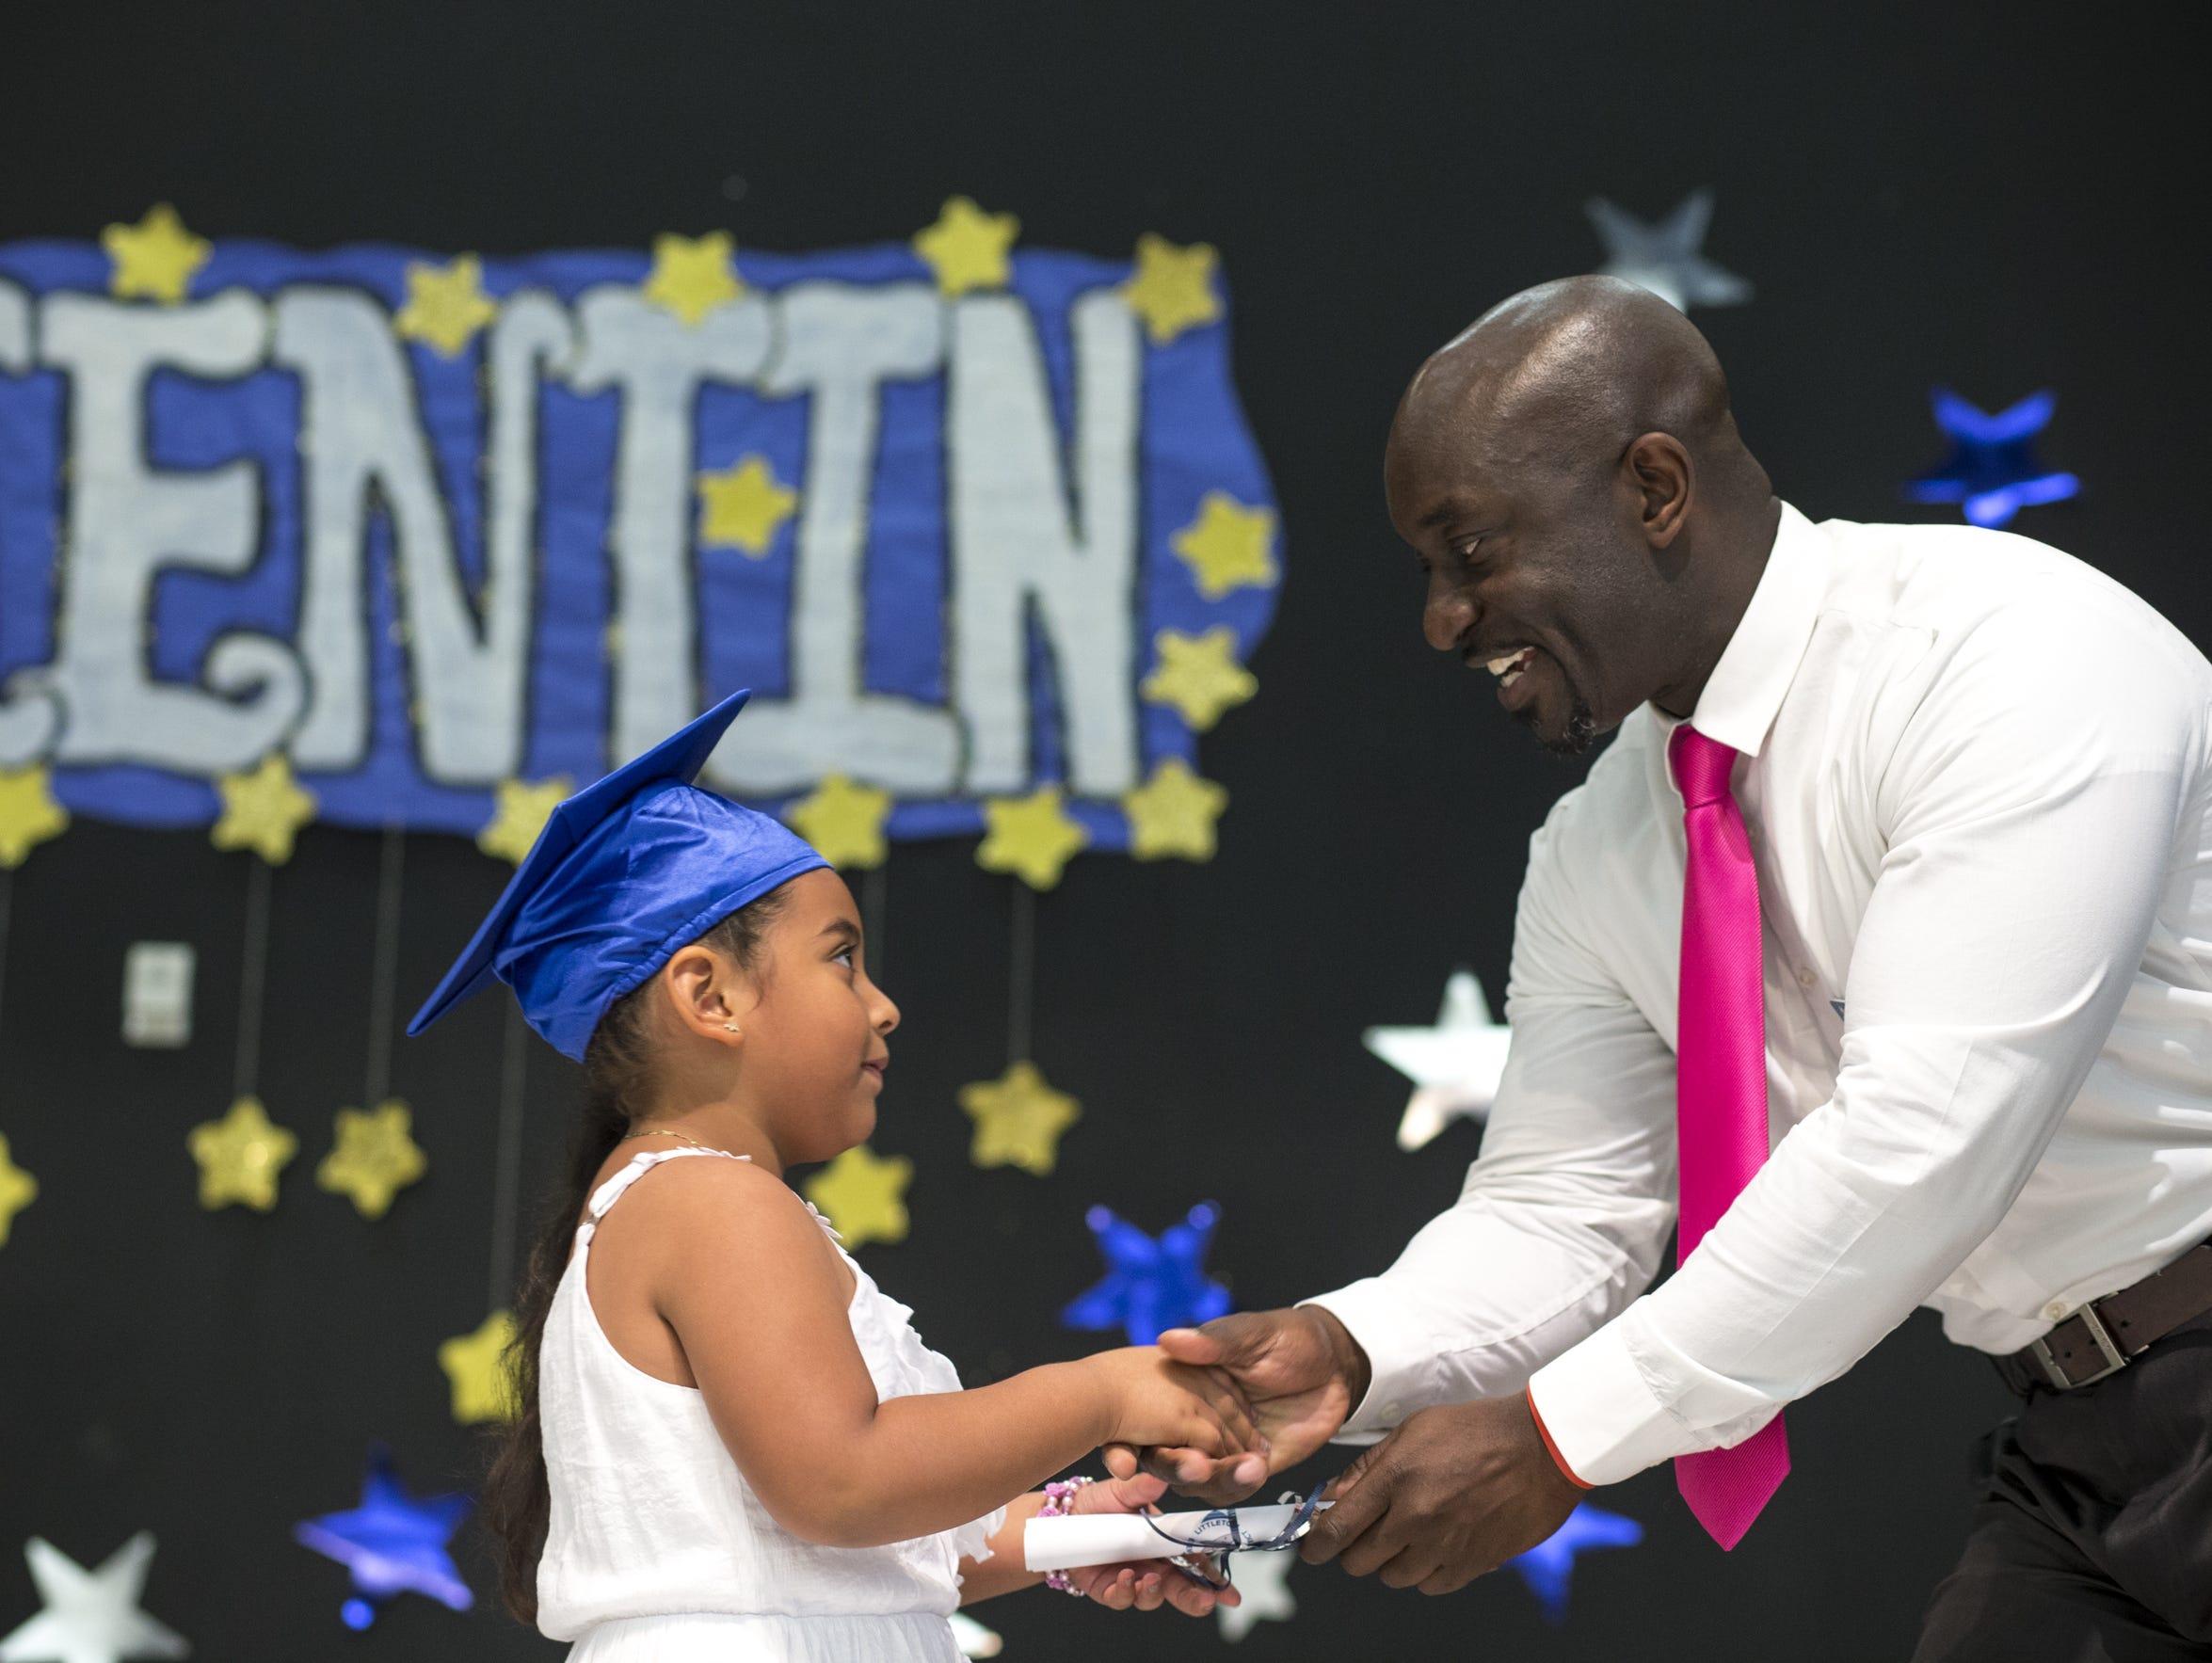 Principal Eric Atuahene presents Jenneyra Ceja Granados